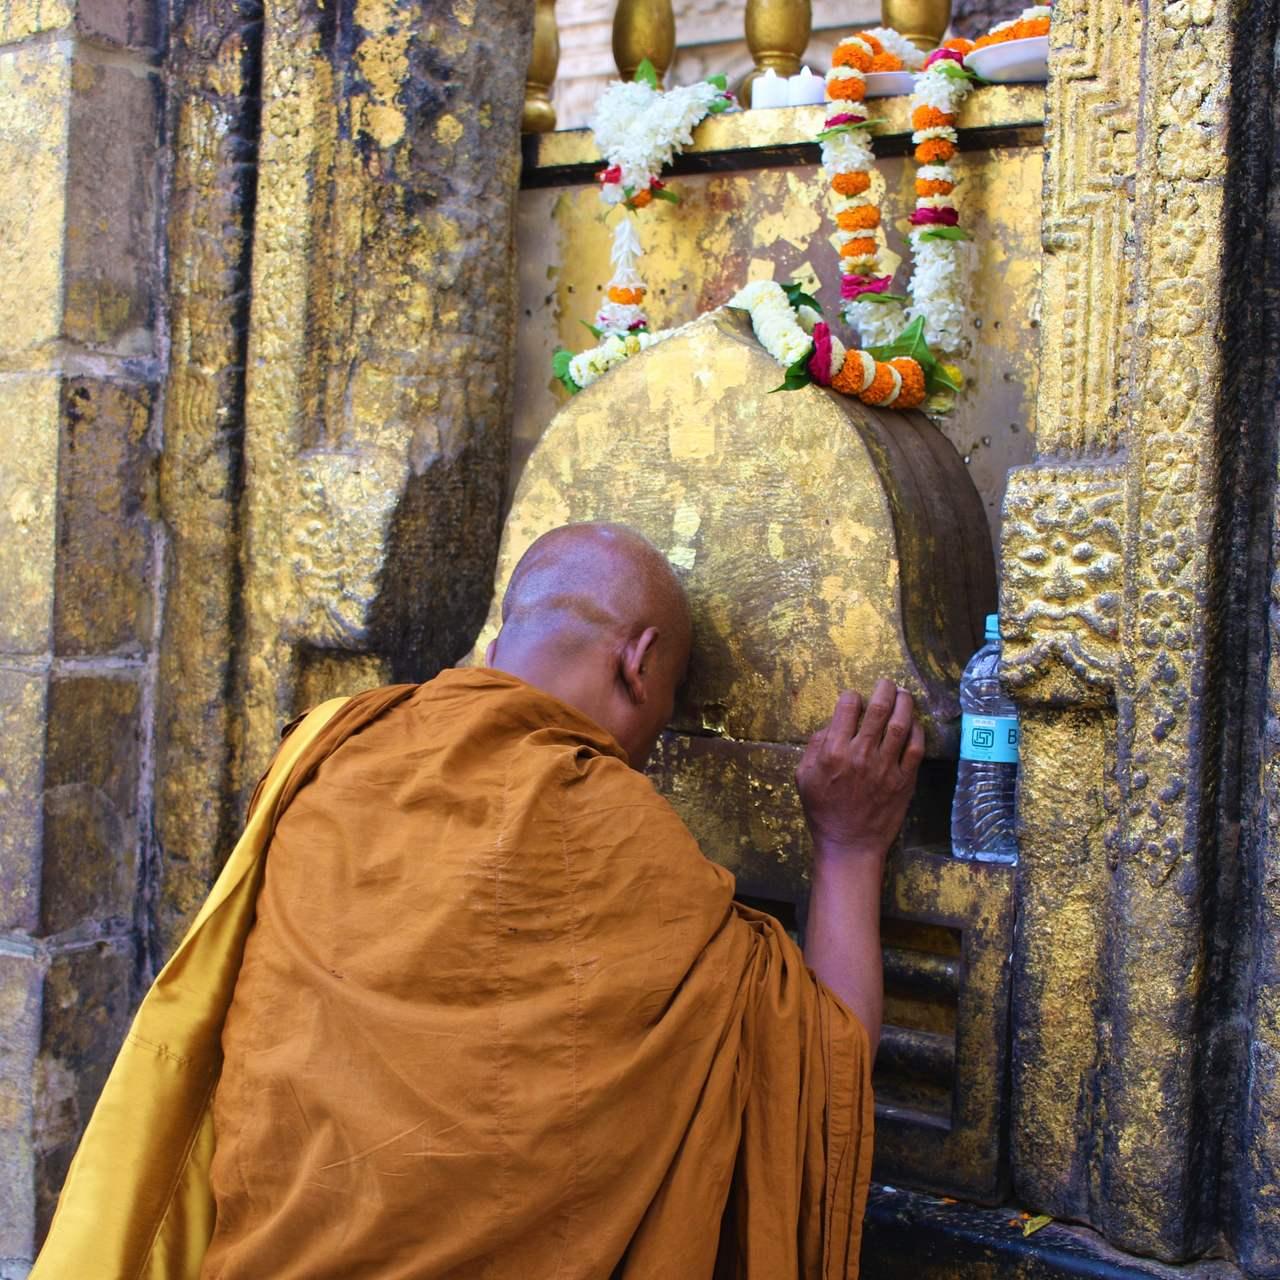 Monge Budista junto à Árvore de Bodhu no Mahabodhi temple